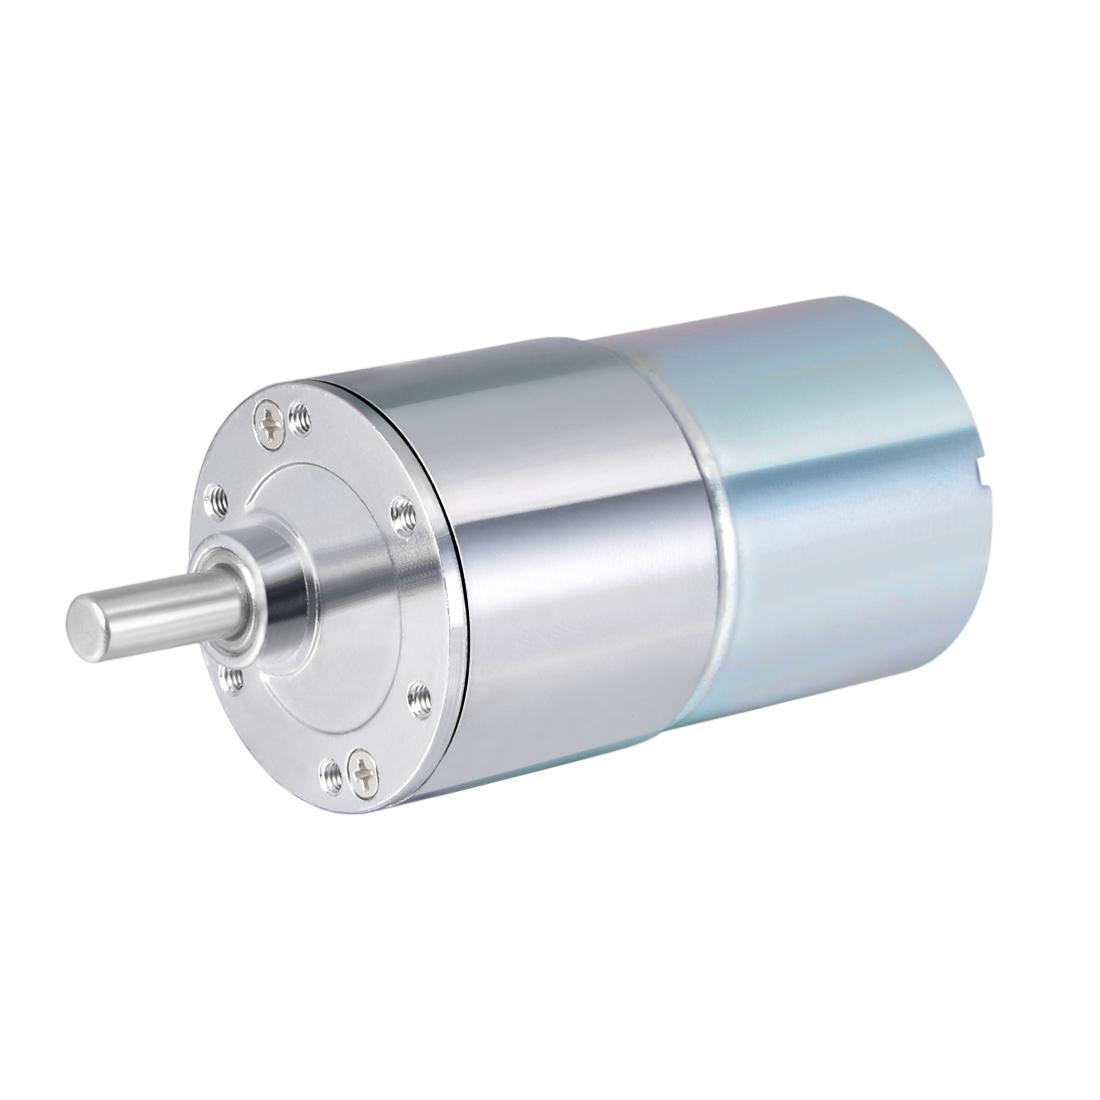 24V DC 20 RPM Gear Motor High Torque Reduction Gearbox Eccentric Output Shaft